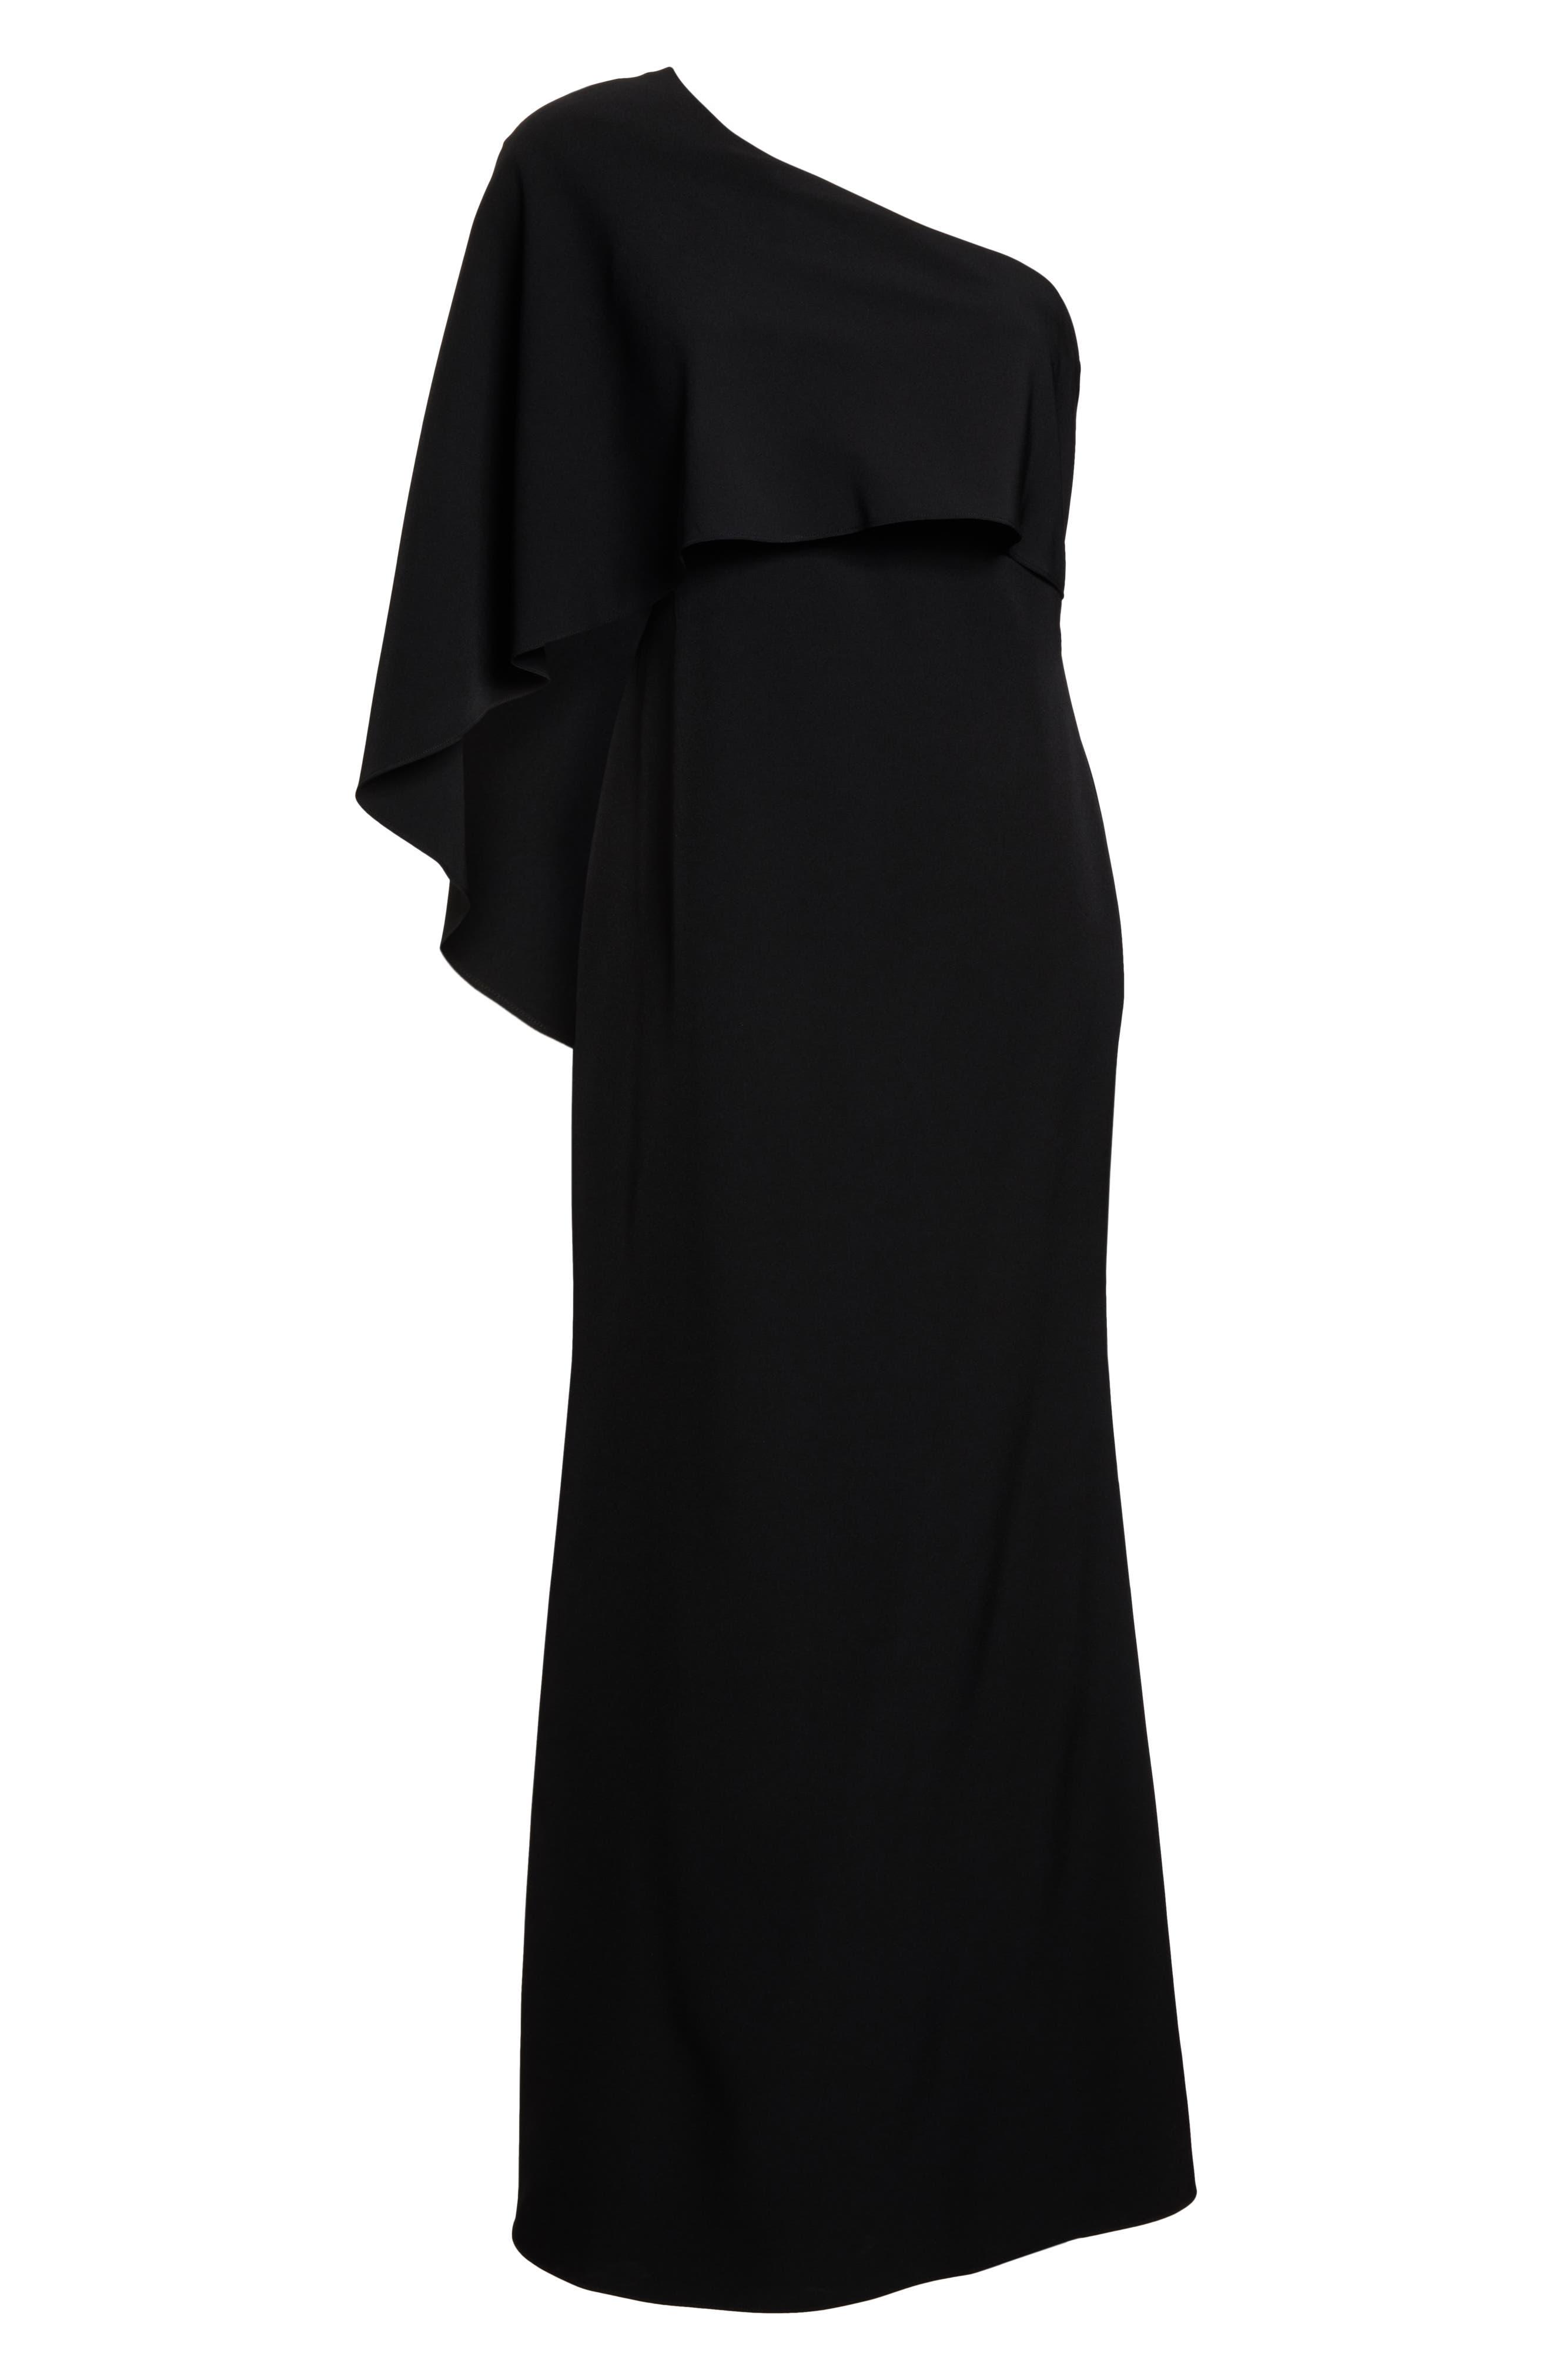 VINCE CAMUTO, One-Shoulder Cape Evening Dress, Alternate thumbnail 7, color, BLACK